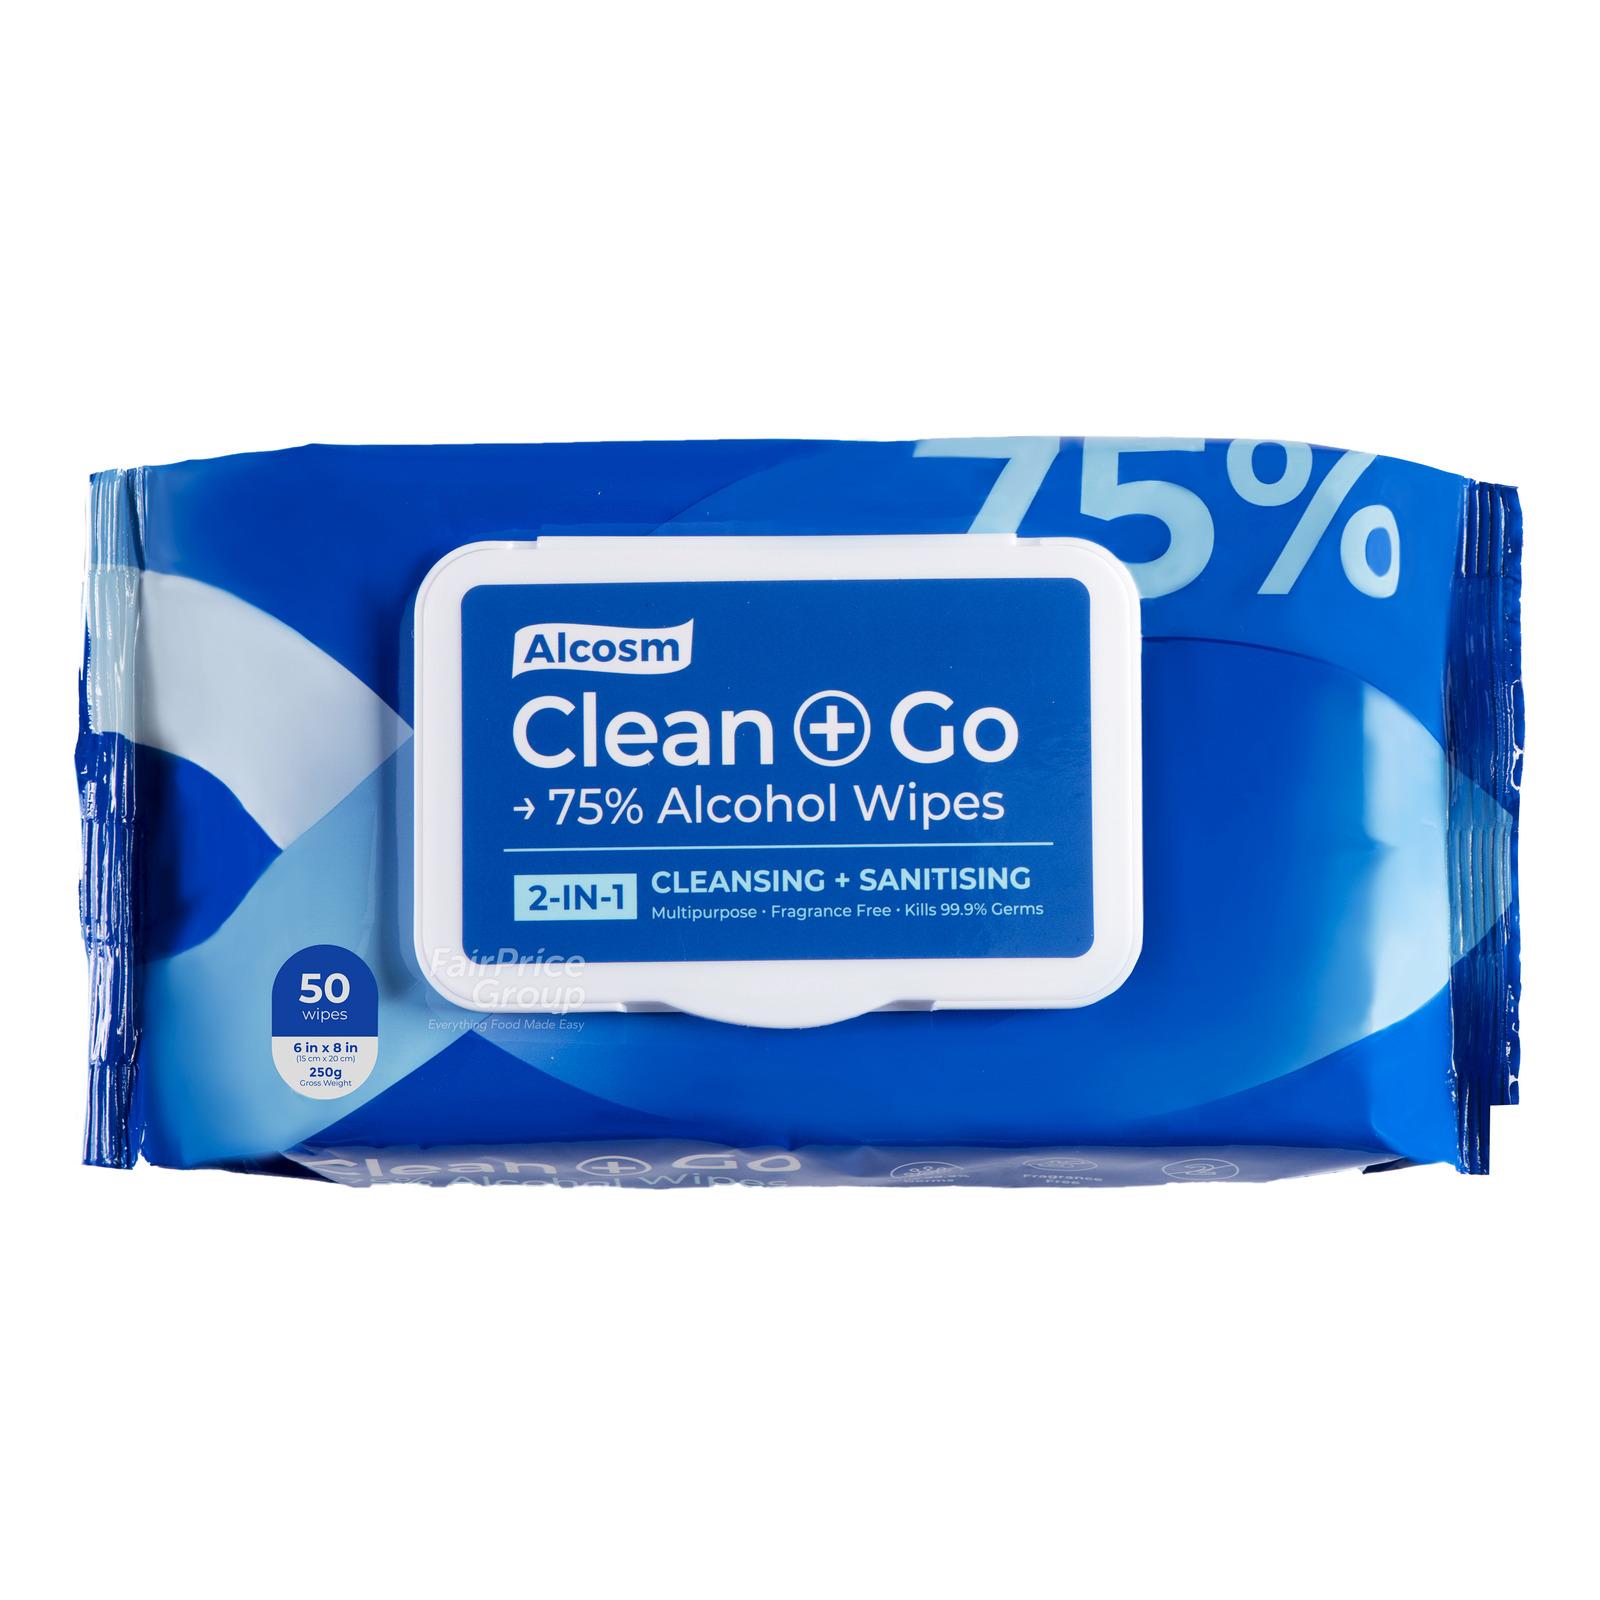 Alcosm Disinfectant Wipes